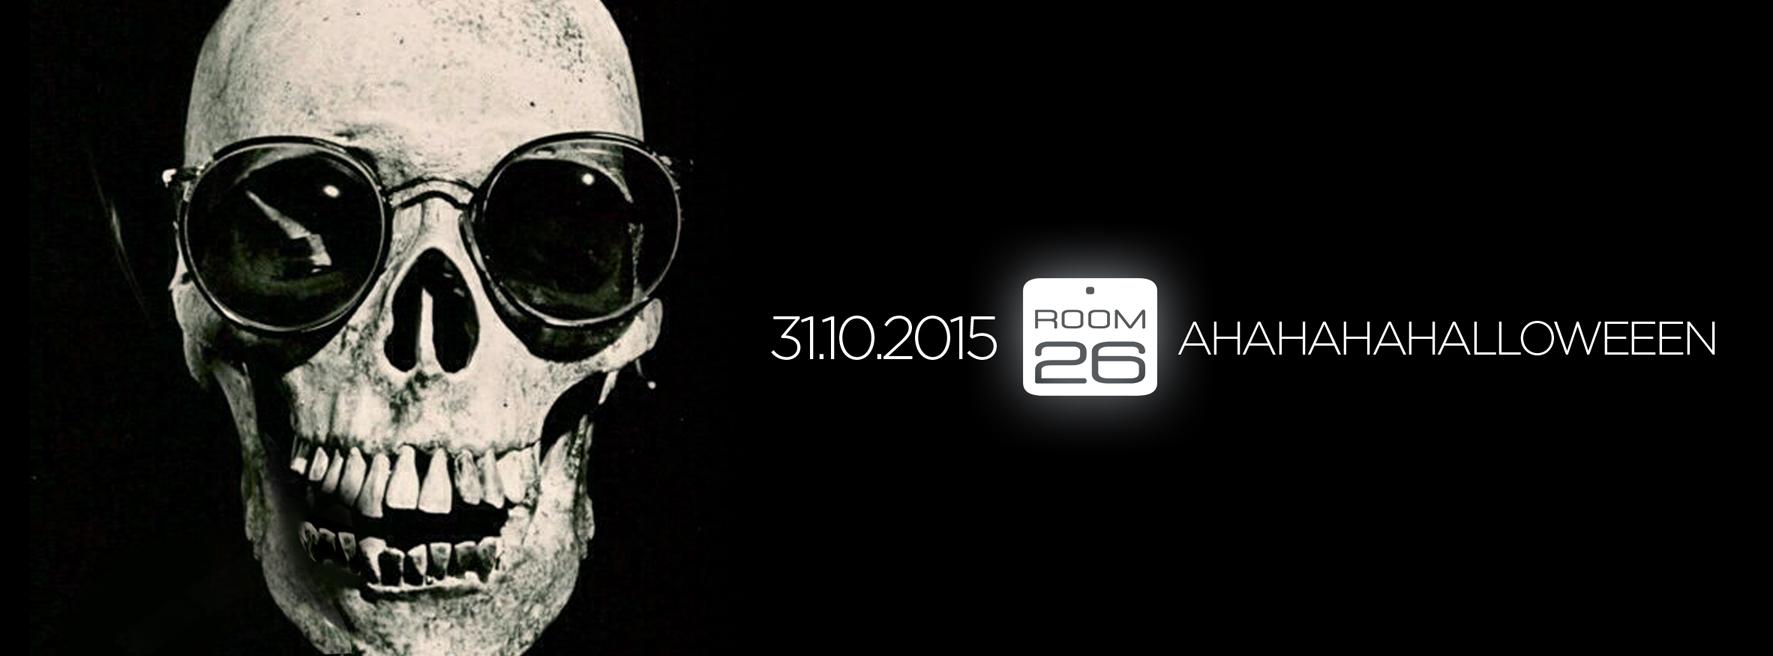 Sabato 31 Ottobre 2015 Halloween Room 26